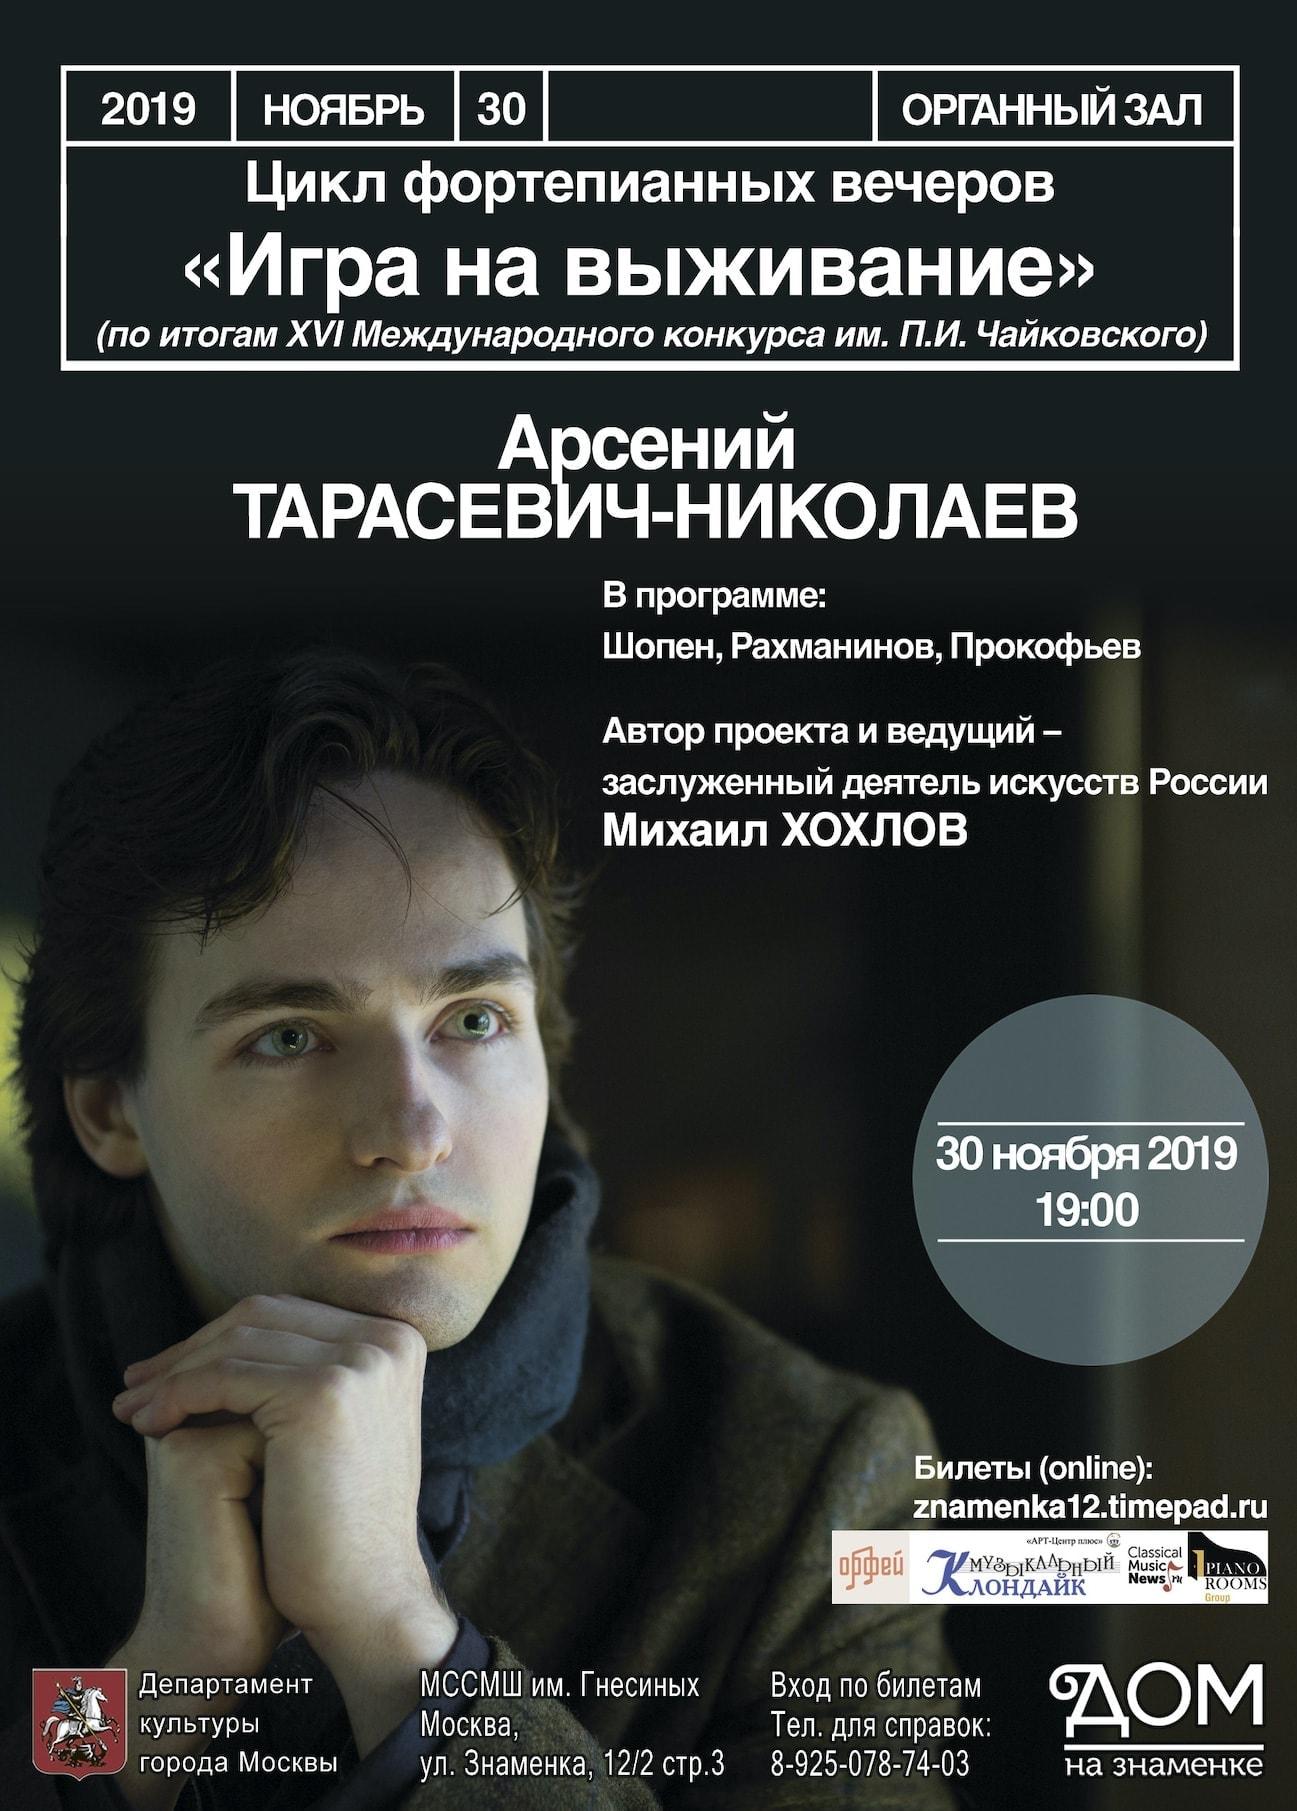 «Игра на выживание». Вечер 3. Арсений Тарасевич-Николаев